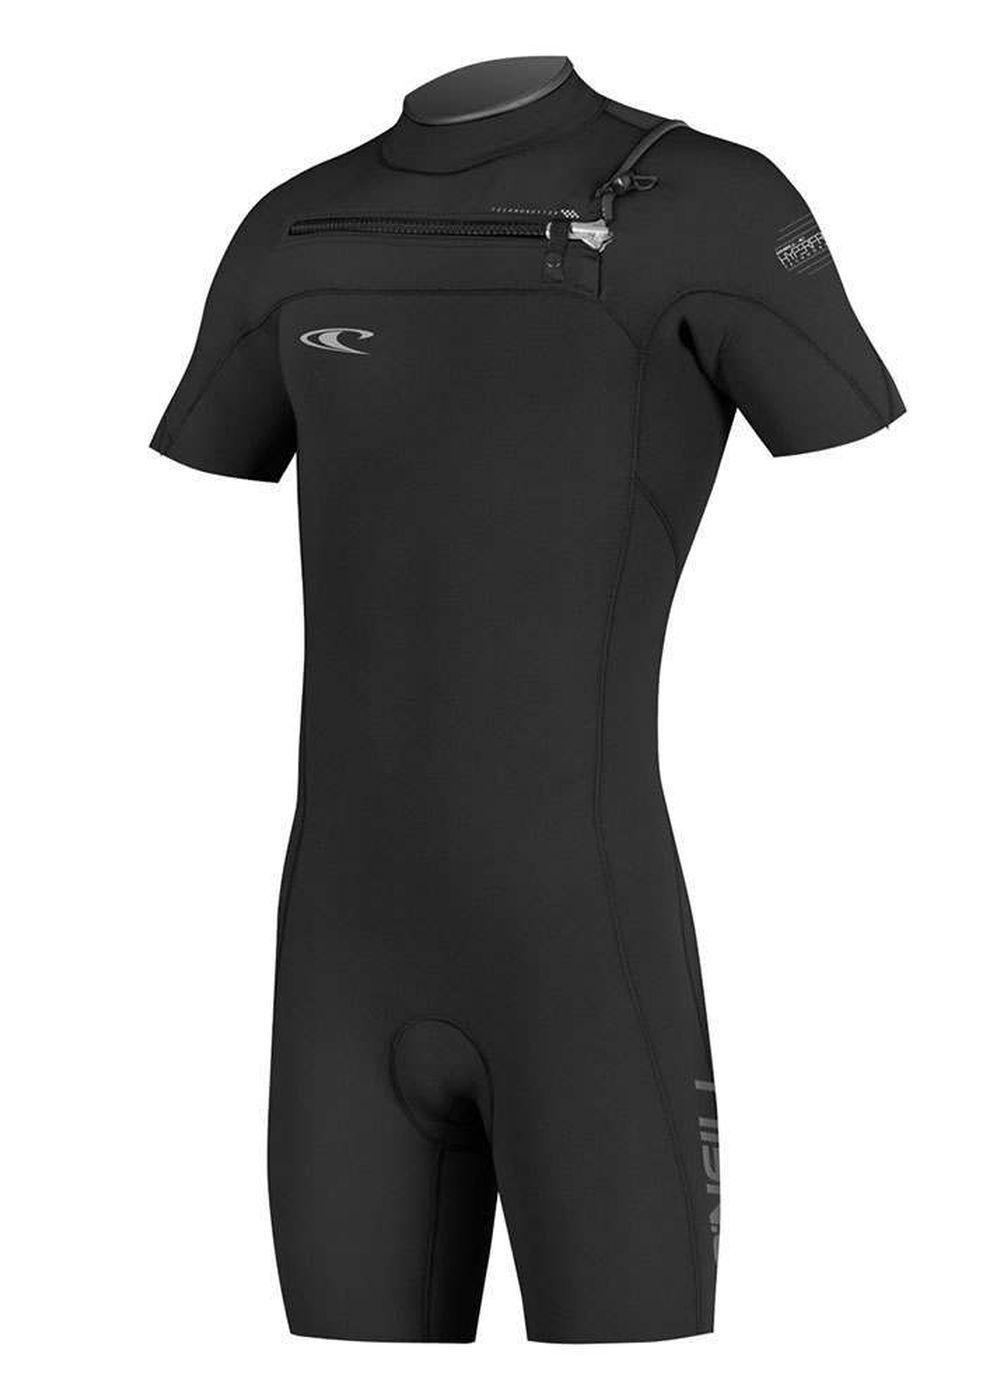 Oneill Hyperfreak 2mm Gbs Short Sleeve Wetsuit Blk Picture